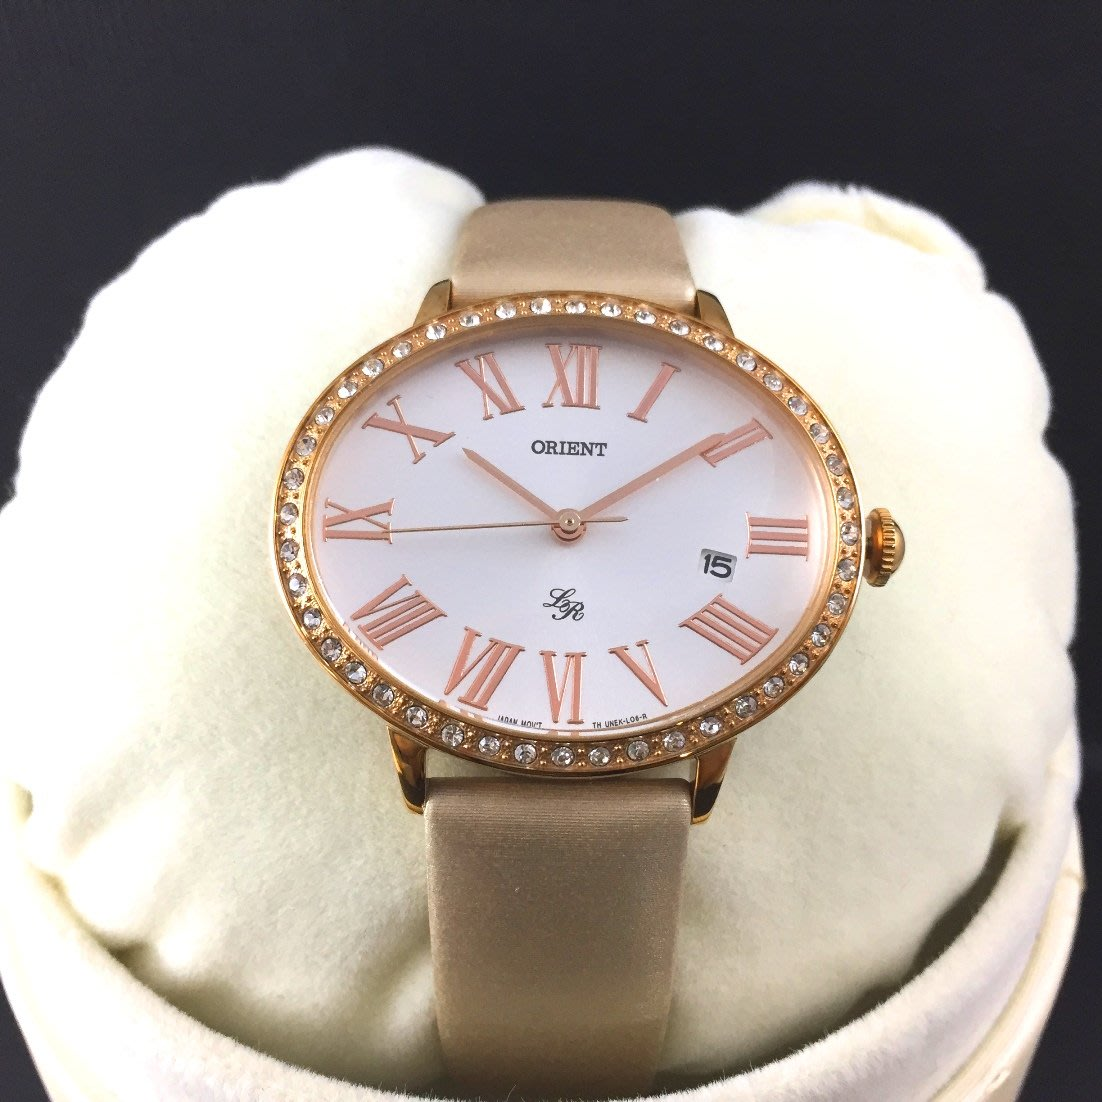 ORIENT 東方錶 LADY ROSE系列 橢圓形石英腕錶 皮帶款 FUNEK003W 玫瑰金 - 36mm*30mm